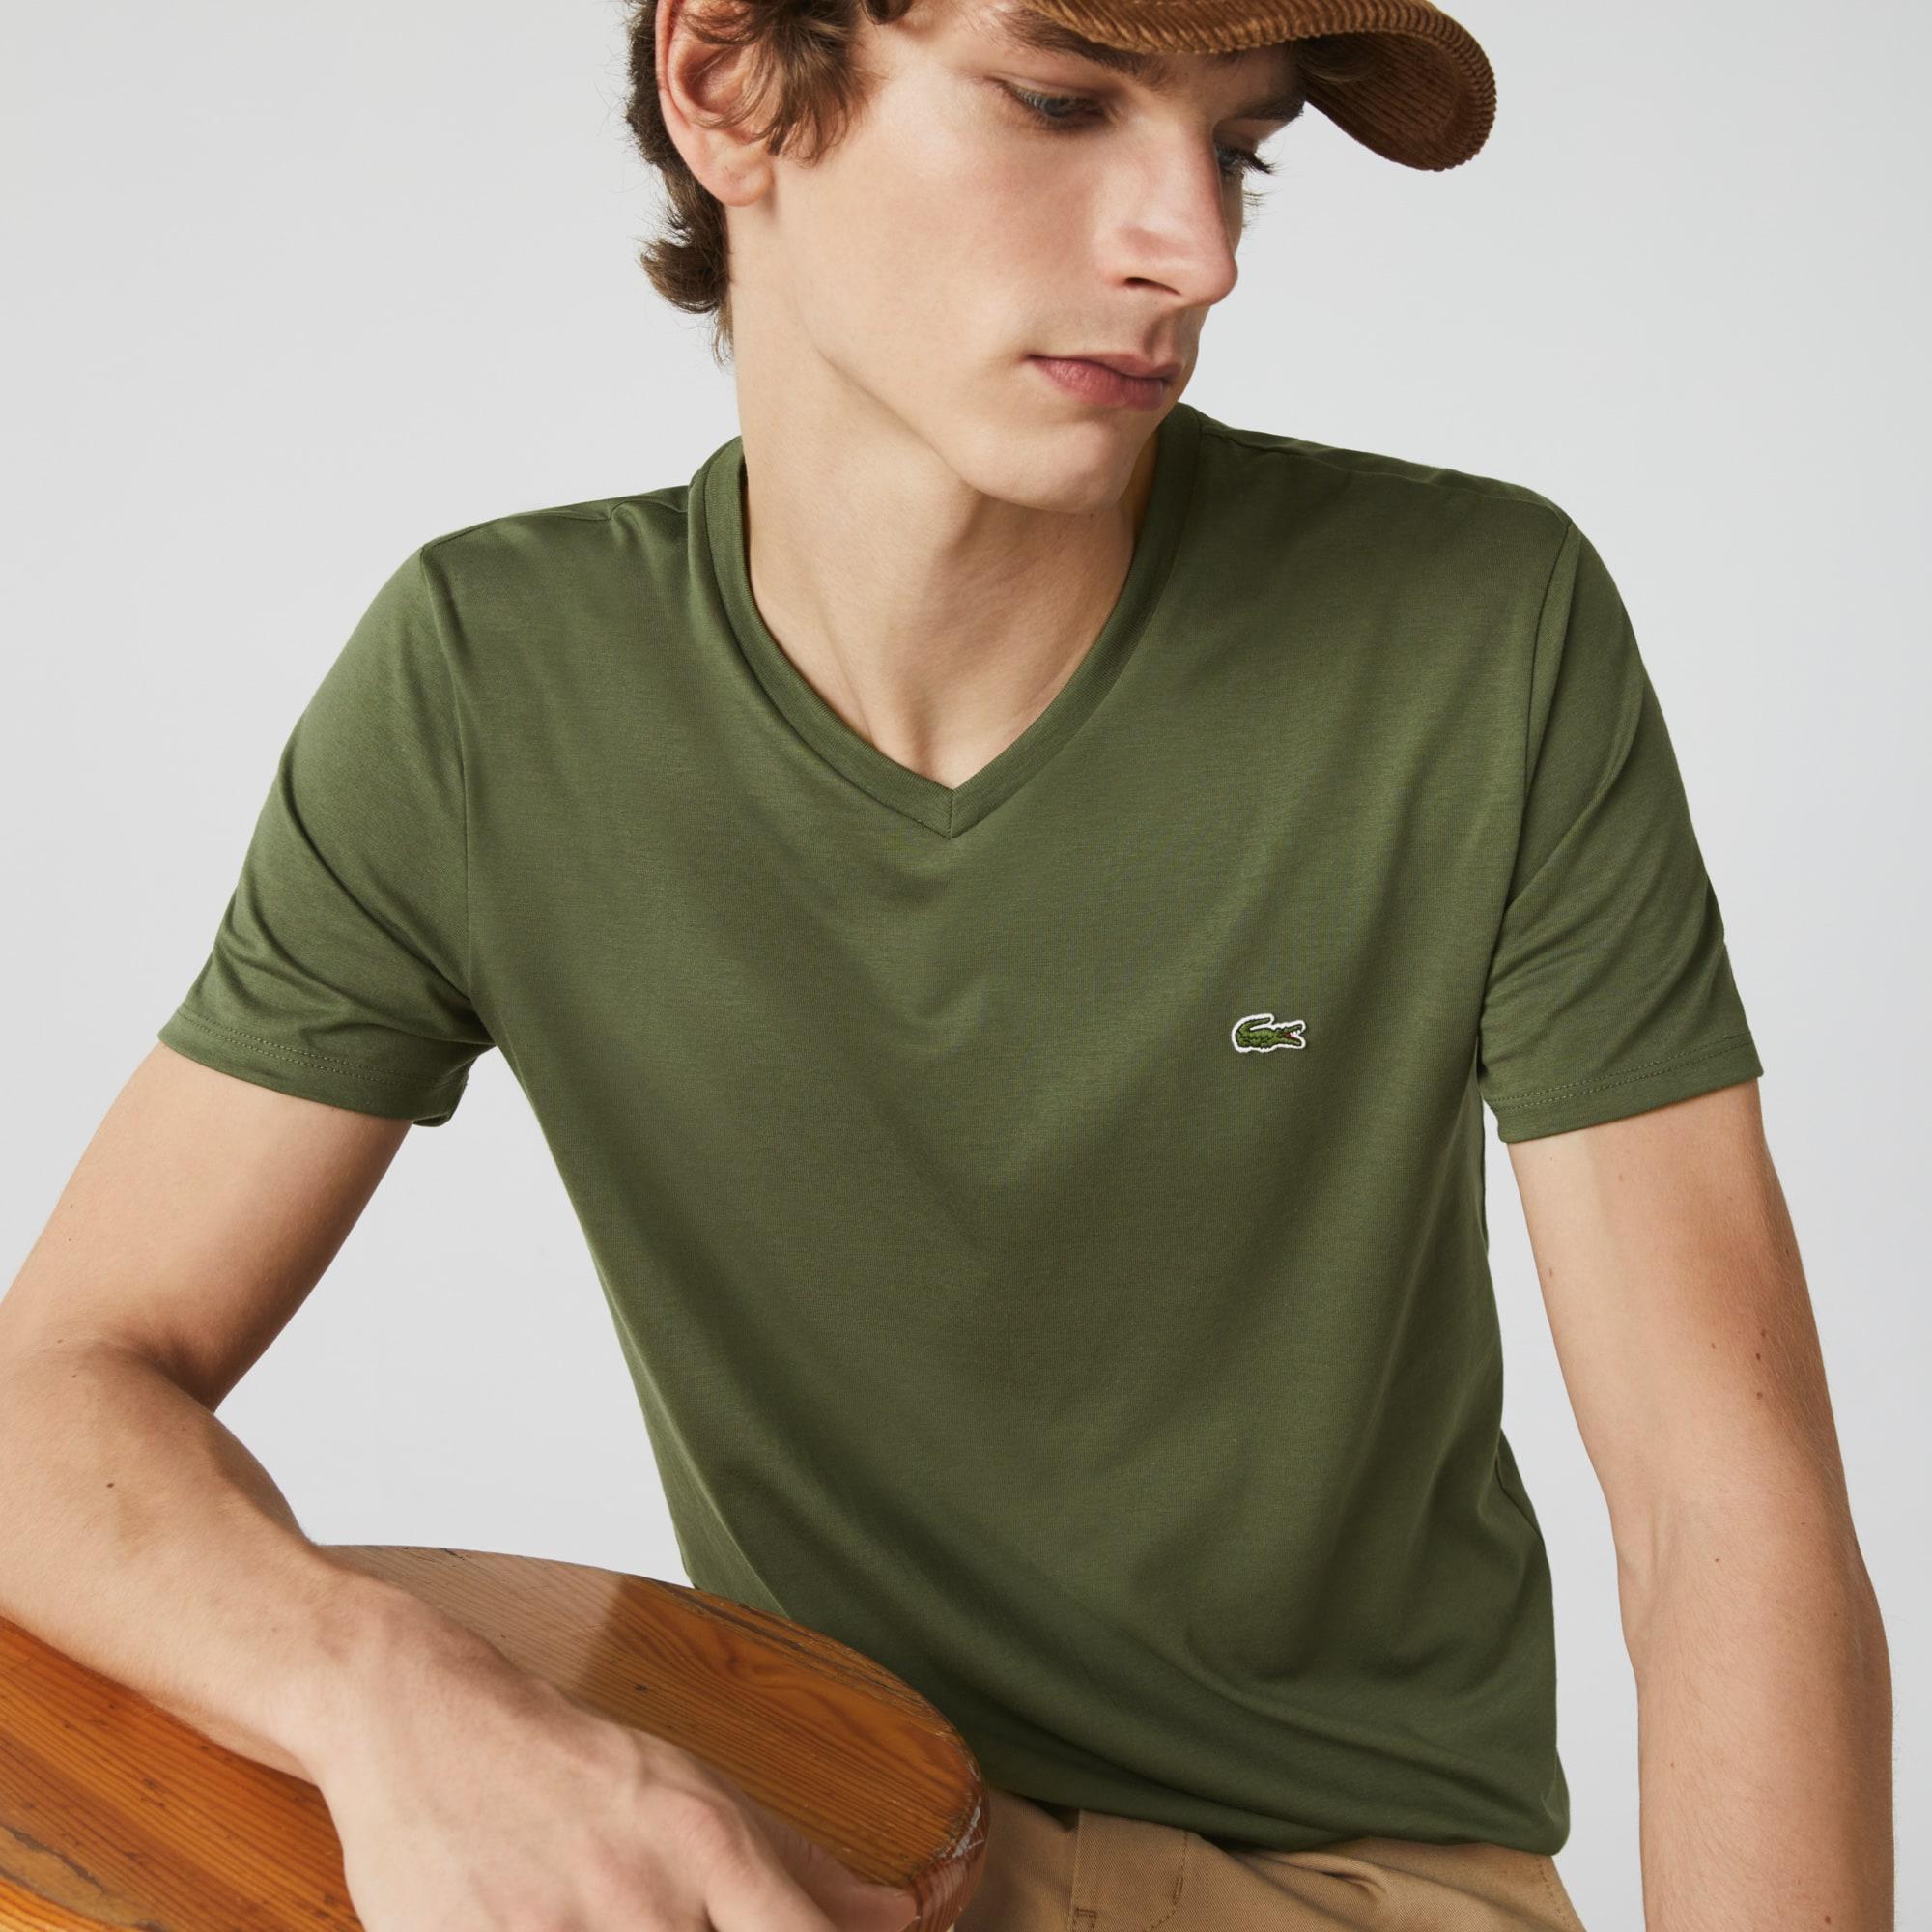 Lacoste Men/'s V-neck Pima Cotton T-shirt YELLOW• 6XP TH6710-51 NEW 2019